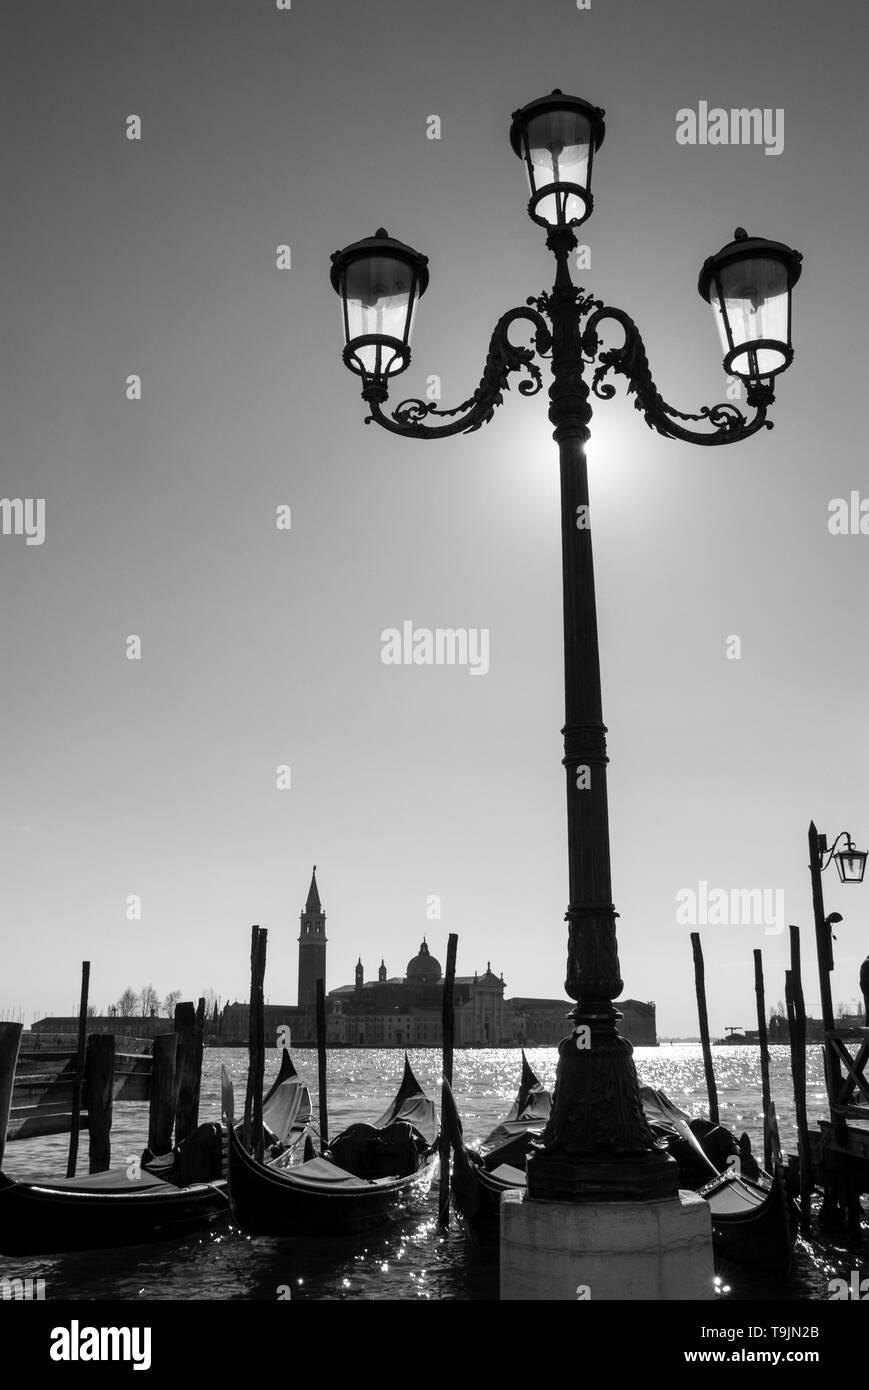 VENICE ITALY VENICE Venetian lamp post on the Riva degli Schiavoni leading from St Marks square Venice Italy EU Europe - Stock Image